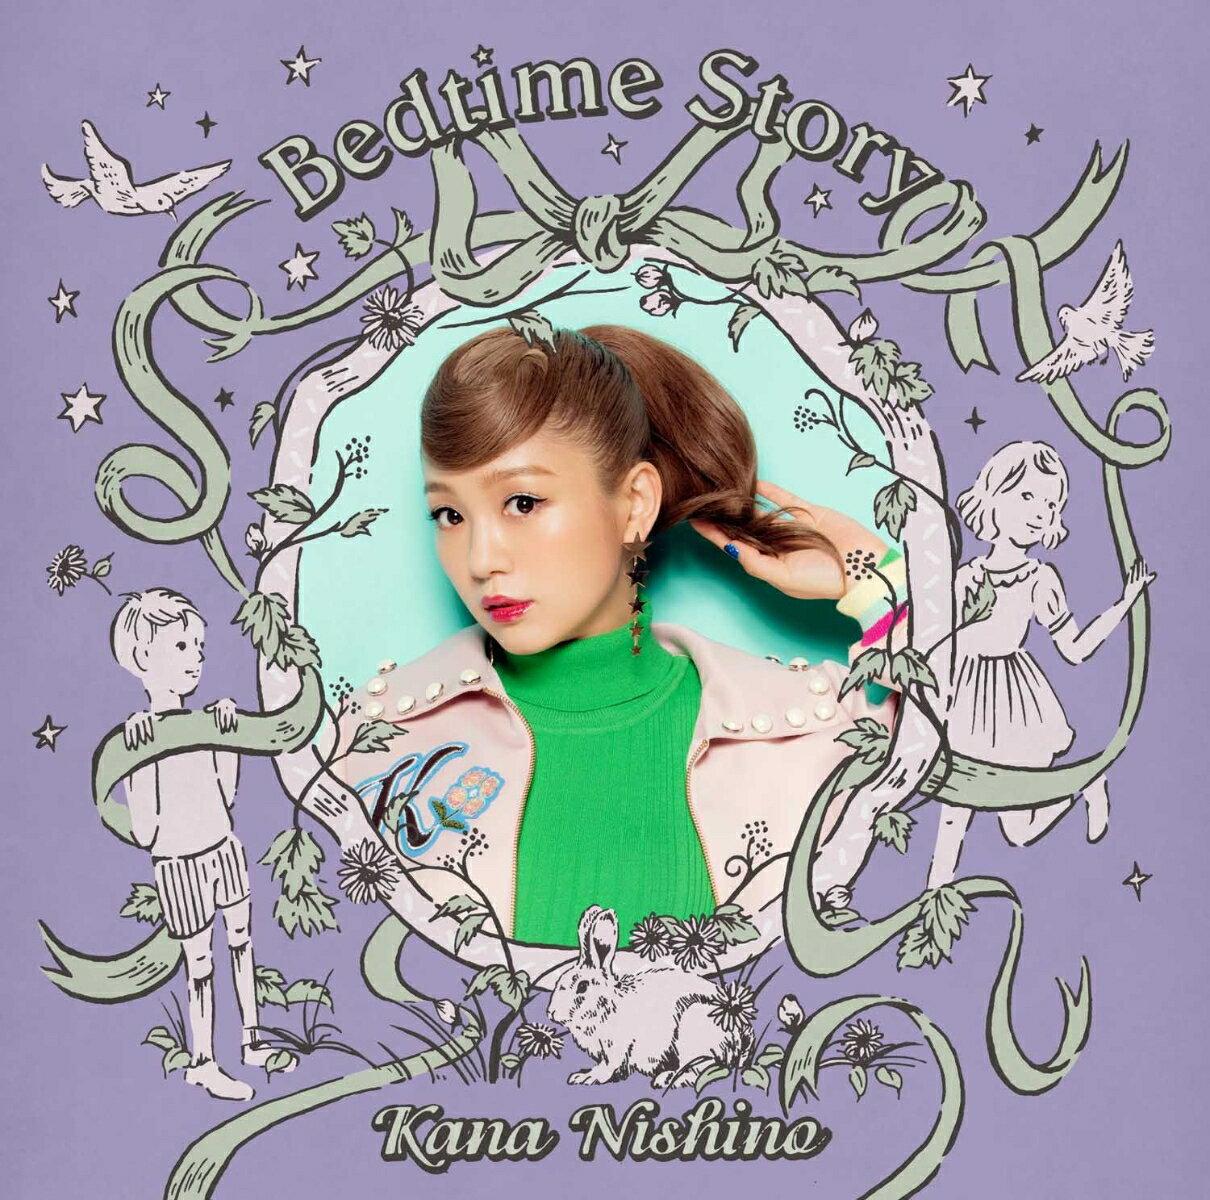 Bedtime Story (初回限定盤 CD+DVD) [ 西野カナ ]